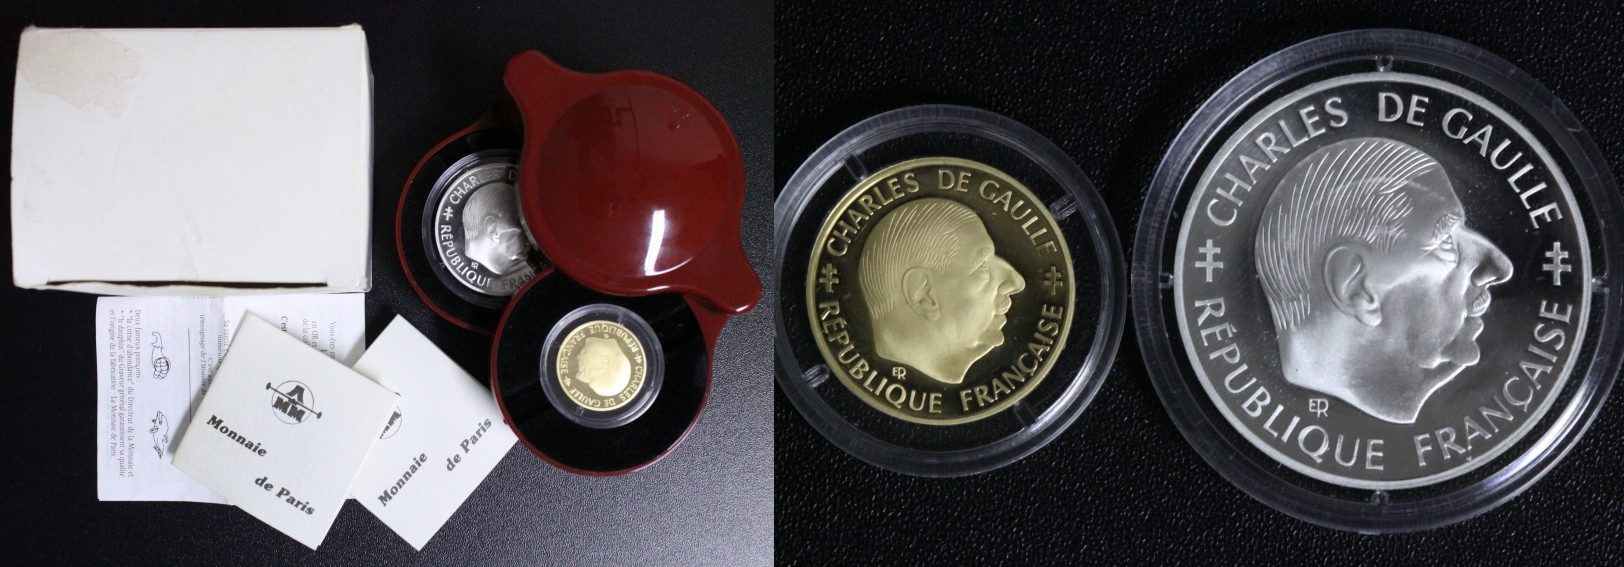 Satz 2x 1 Franc 1988 Frankreich 30 Jahre 5. Republik - Charles de Gaulle - GOLD & SILBER PP*/OVP/Zert.